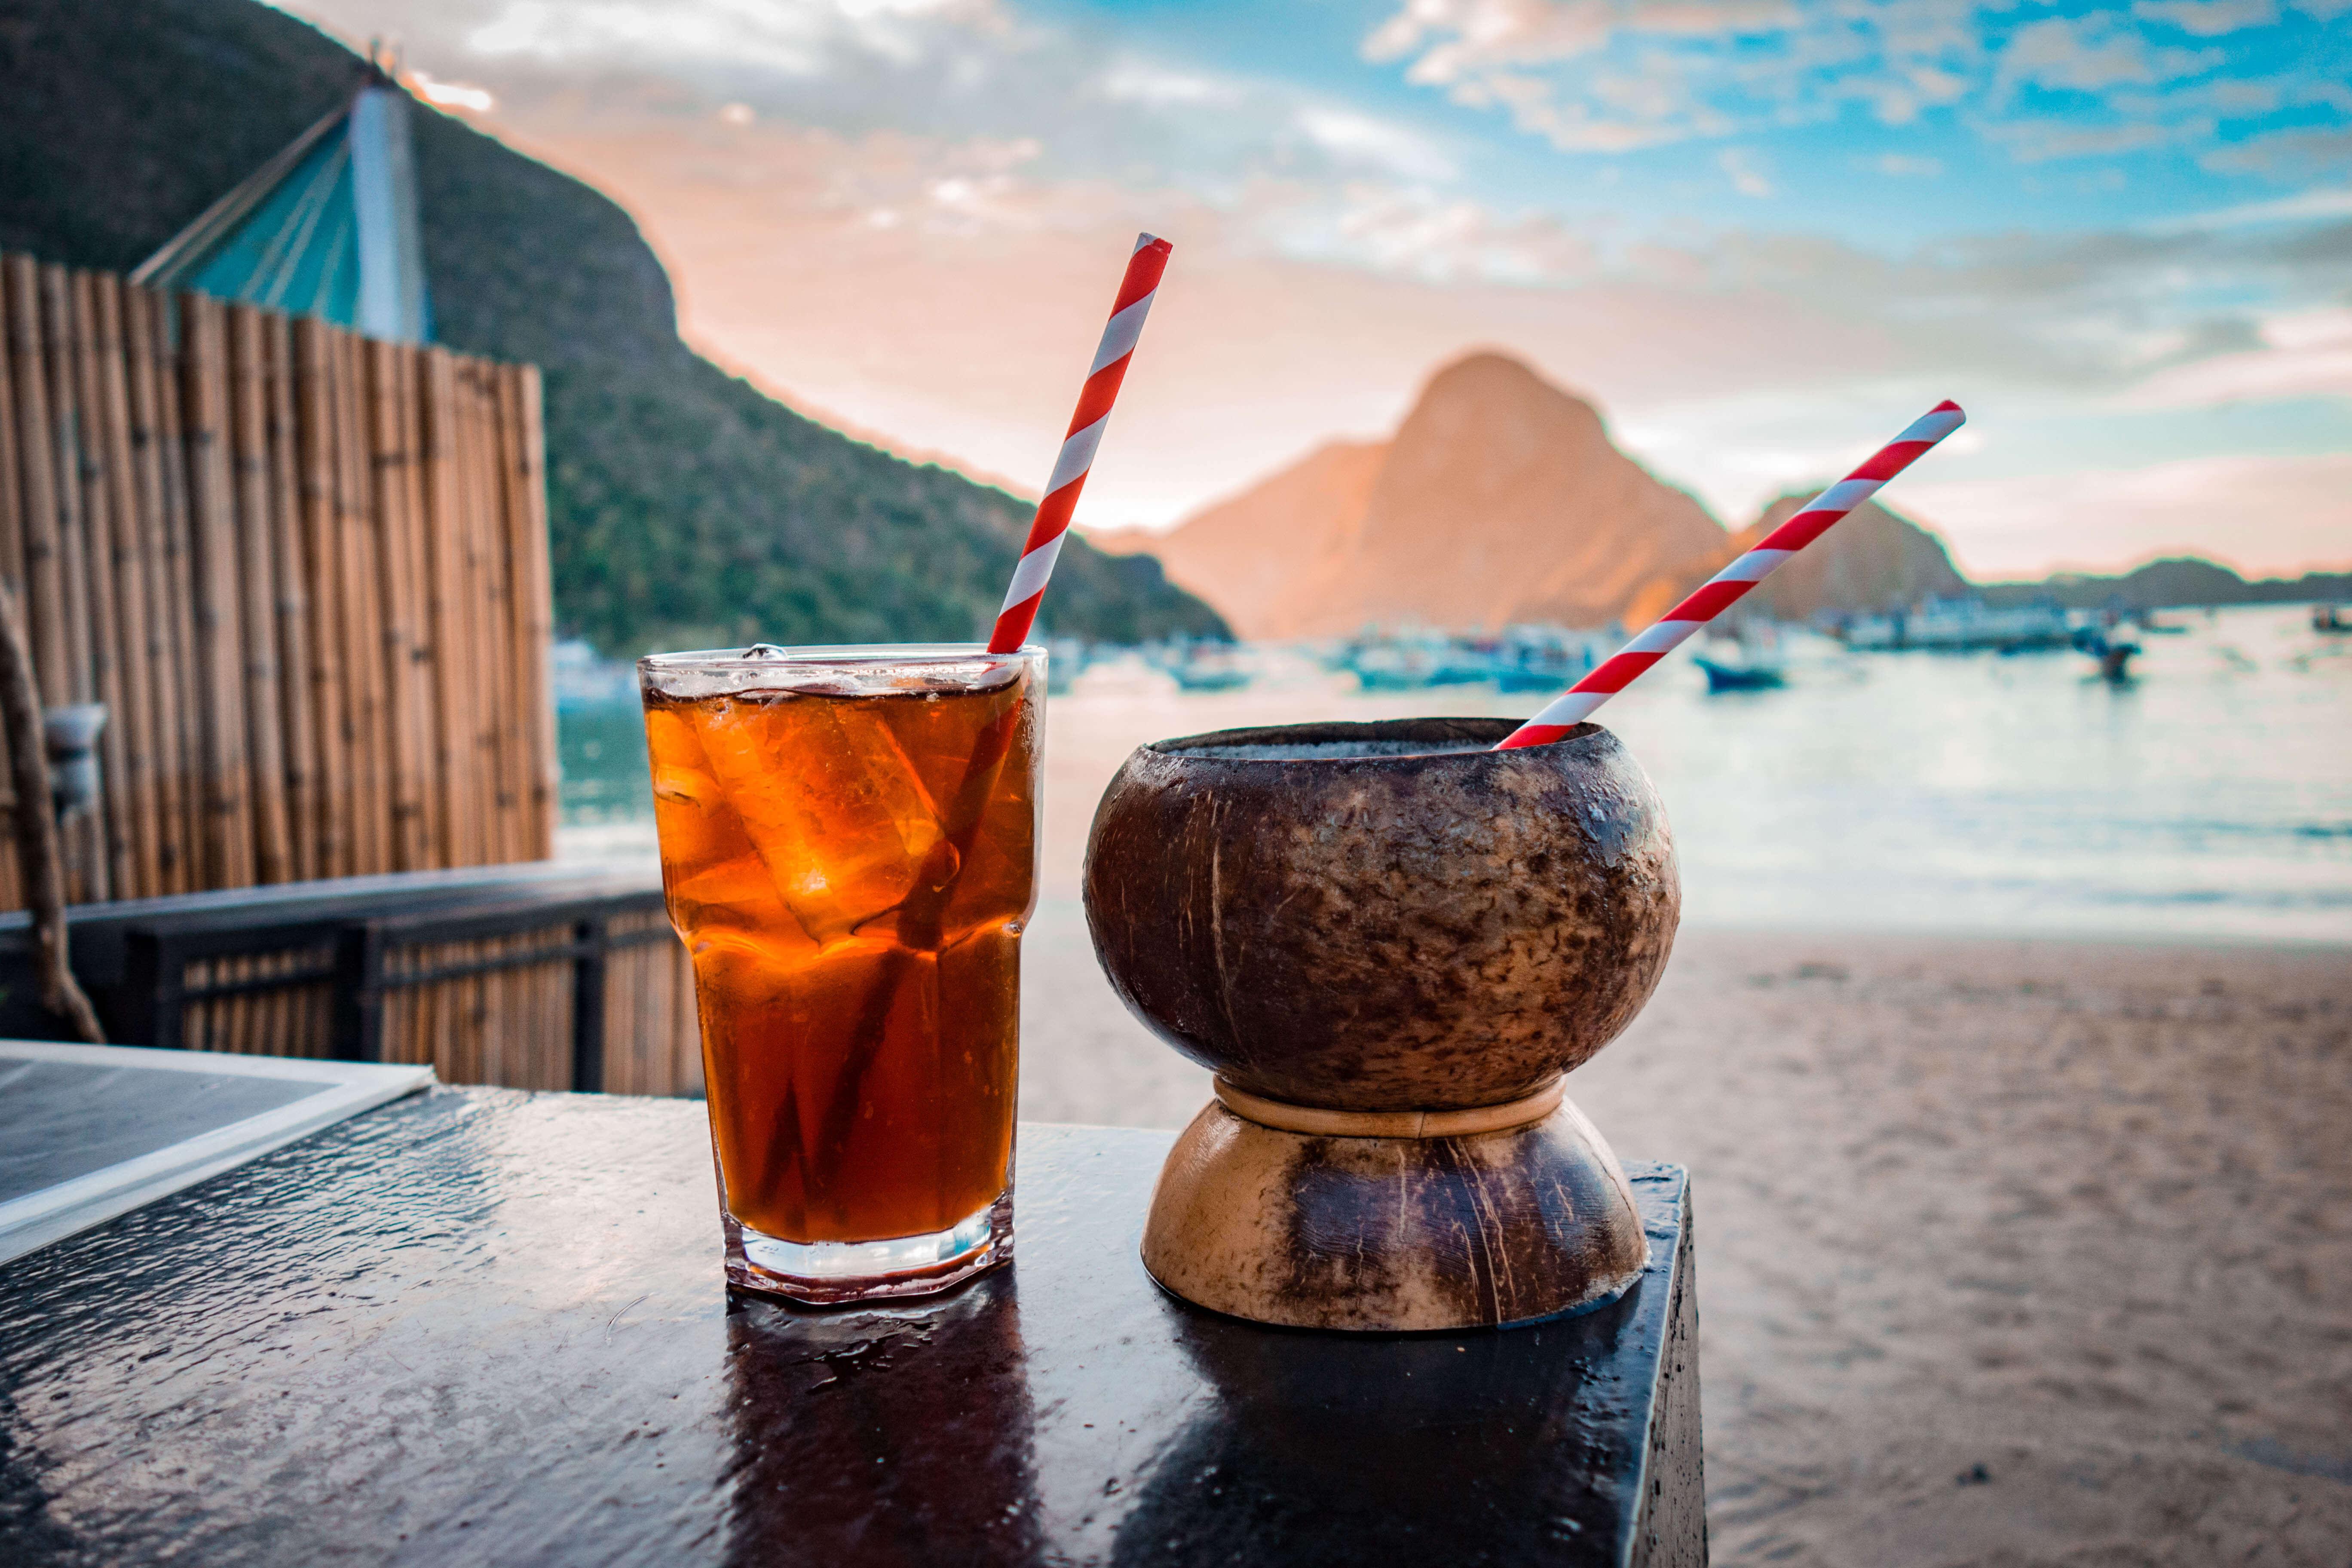 Firts Cocktail at El Nindo